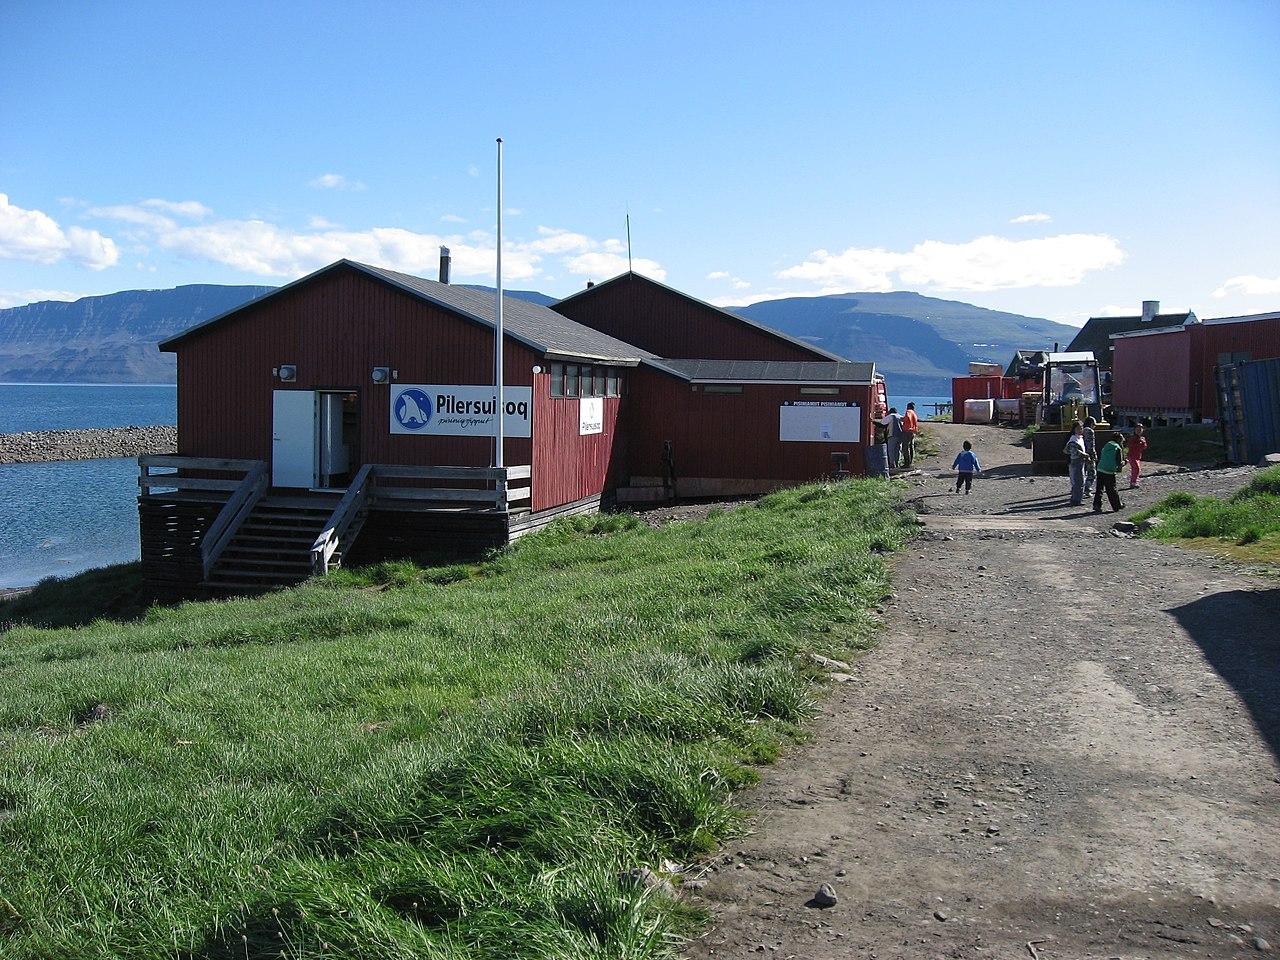 File Pilersuisoq Upernavik Kujalleq 2007 07 24 Jpg Wikimedia Commons